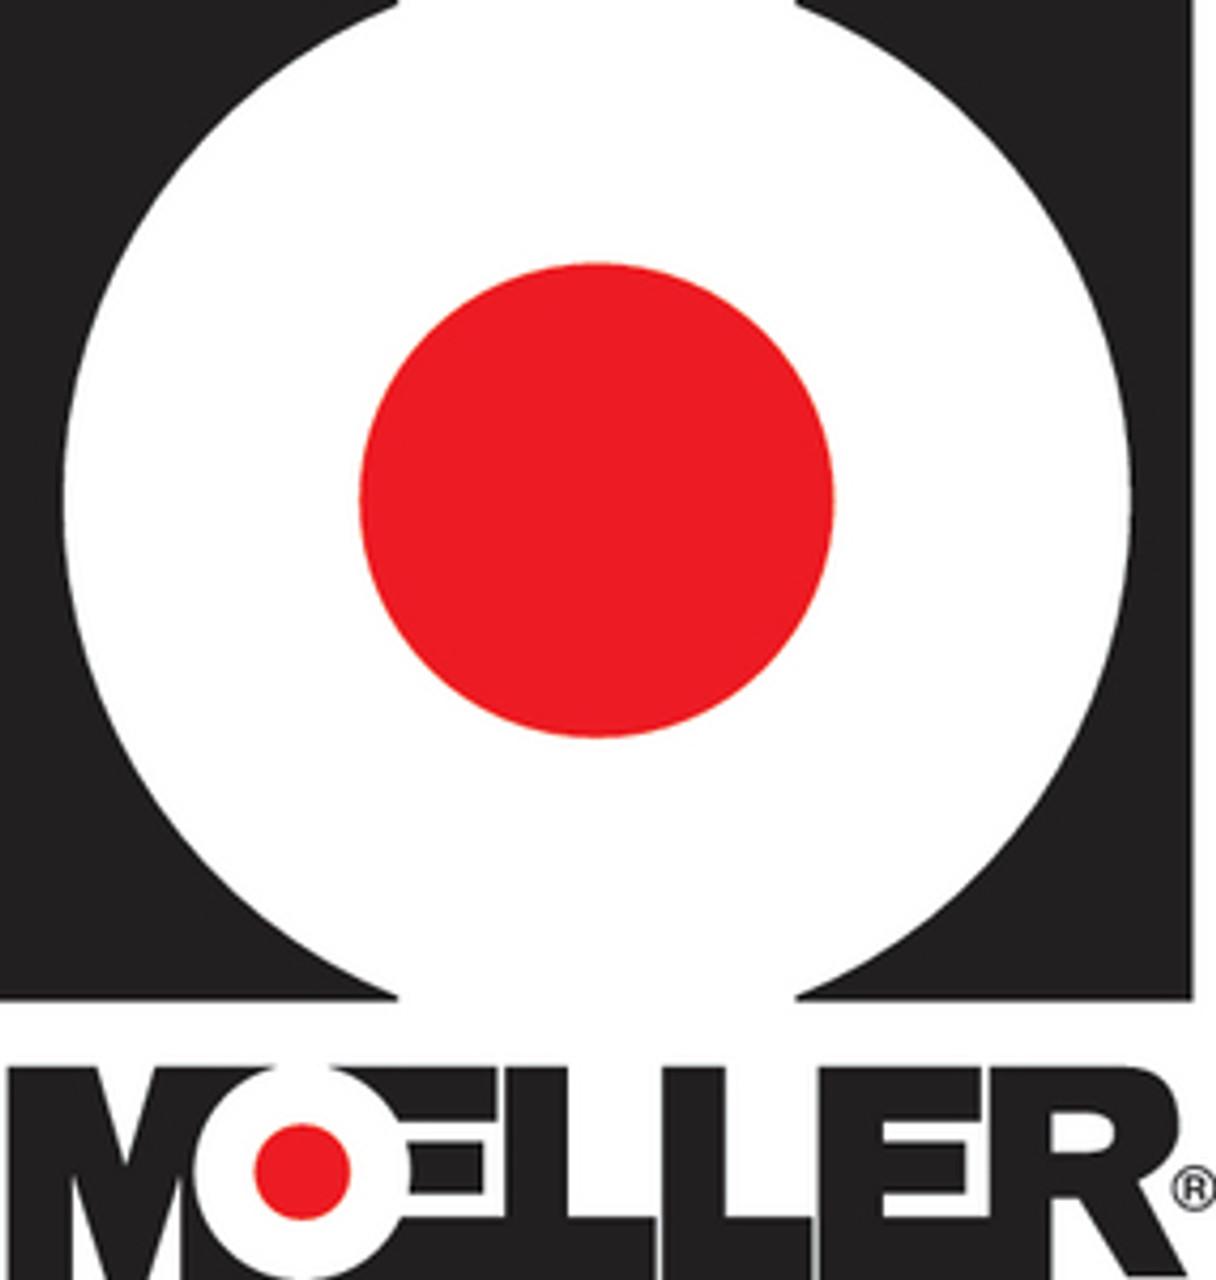 Moeller Marine Products 033801-10 1//4 NPT Moeller Marine Aluminum Anti-Siphon Barb